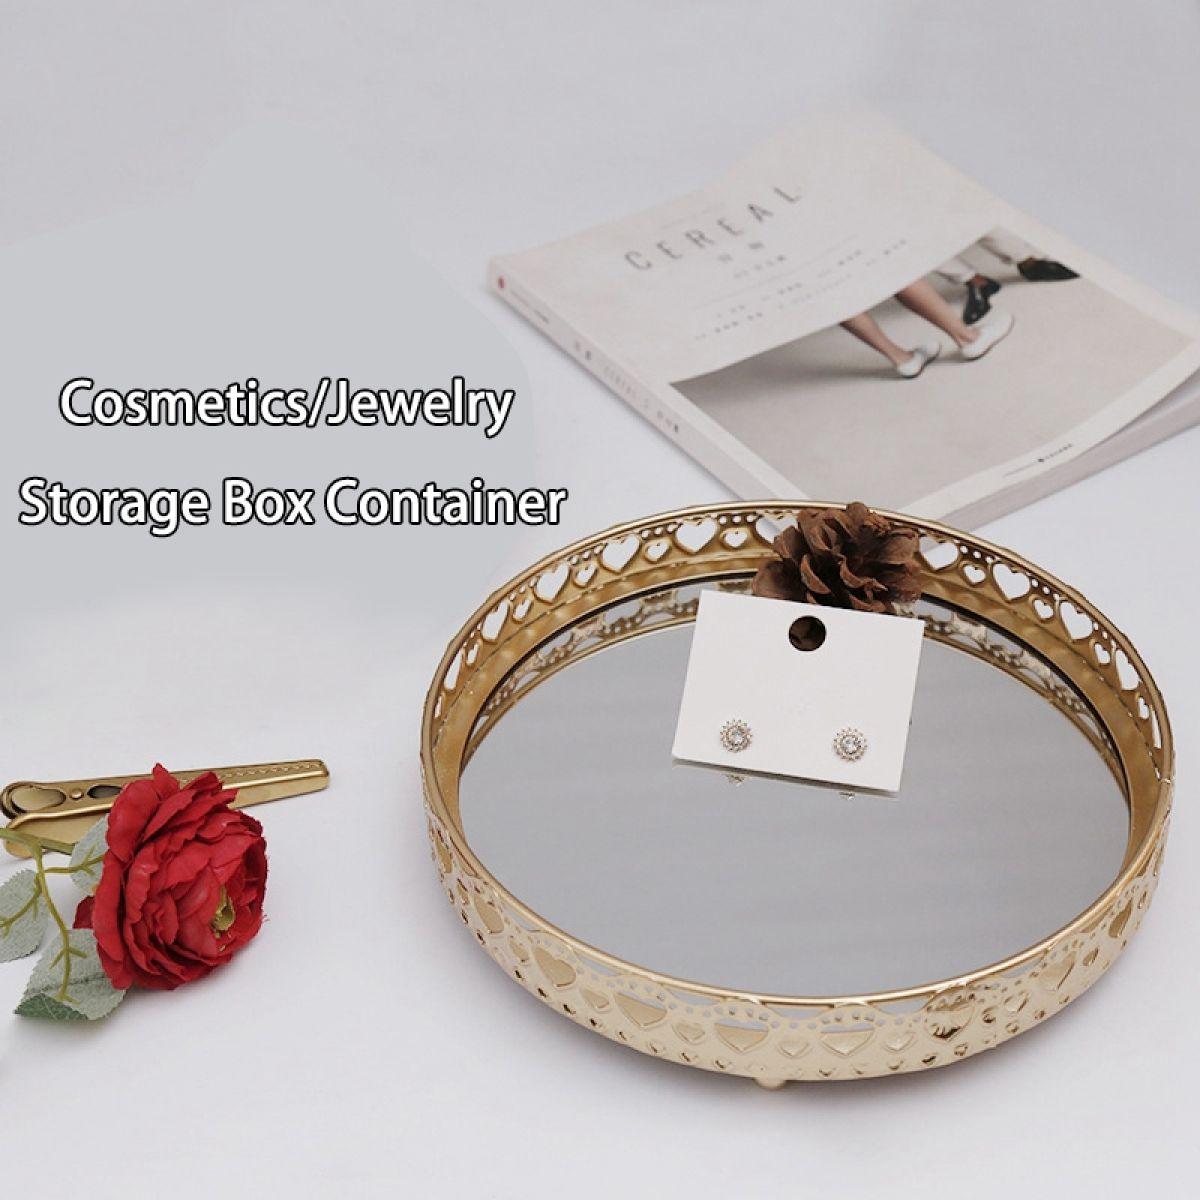 Golden Iron Jewelry Storage Tray Glass Mirror Base Bedroom Desktop Cosmetic Dessert Decorative Organize Plate Lazada